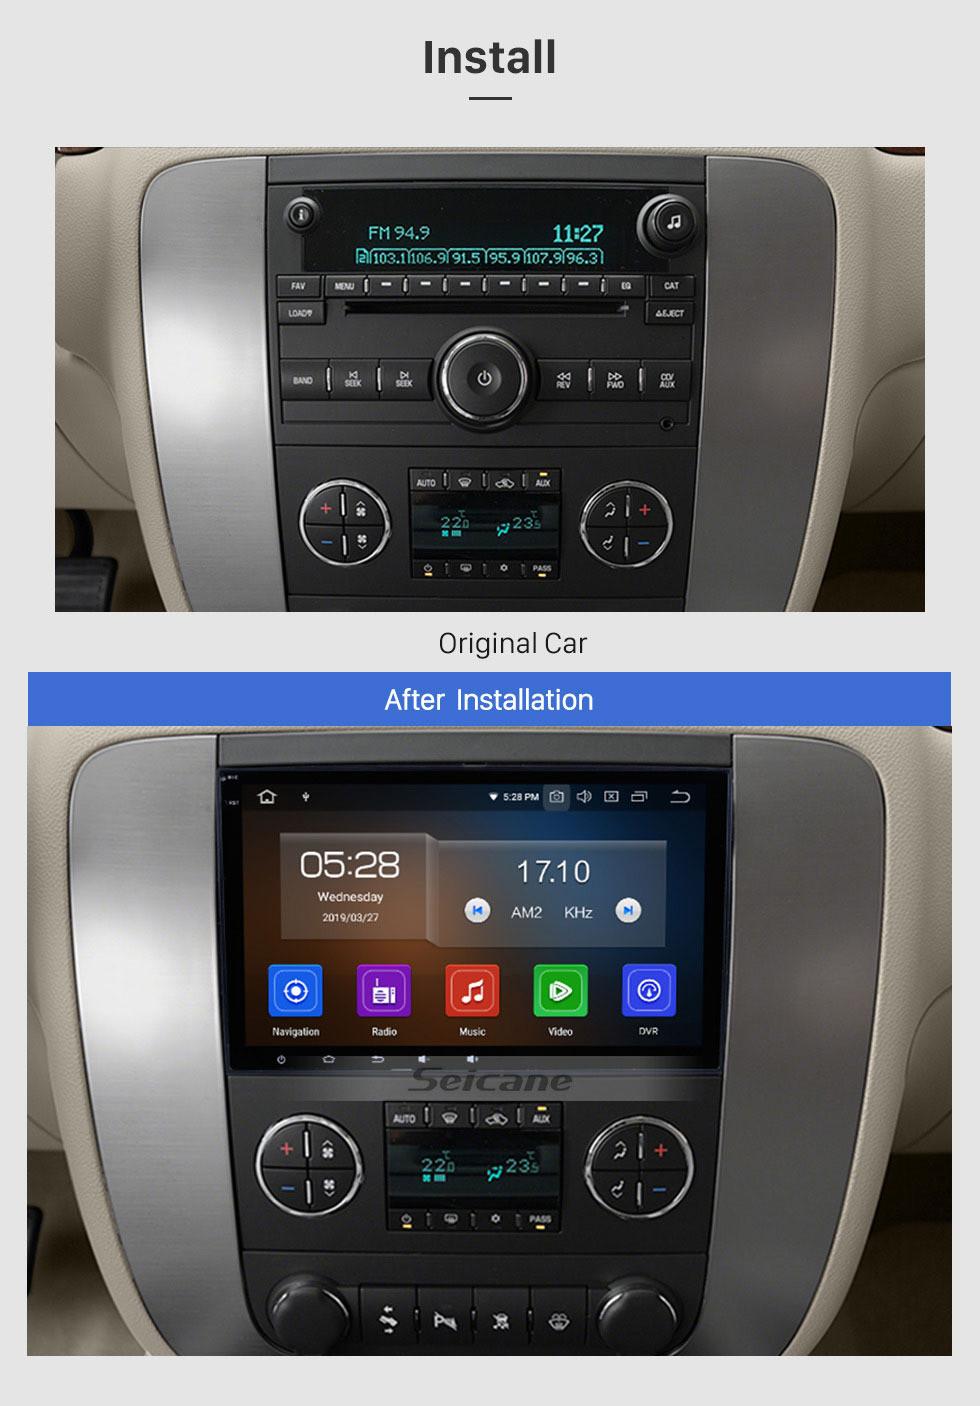 Seicane Android 9.0 2007 2008 2009 2010 2011 GMC Sierra 8 Inch HD Touchscreen Car Radio Head Unit GPS Navigation Music Bluetooth WIFI Support 1080P Video Backup Camera DAB+ DVR Steering Wheel Control